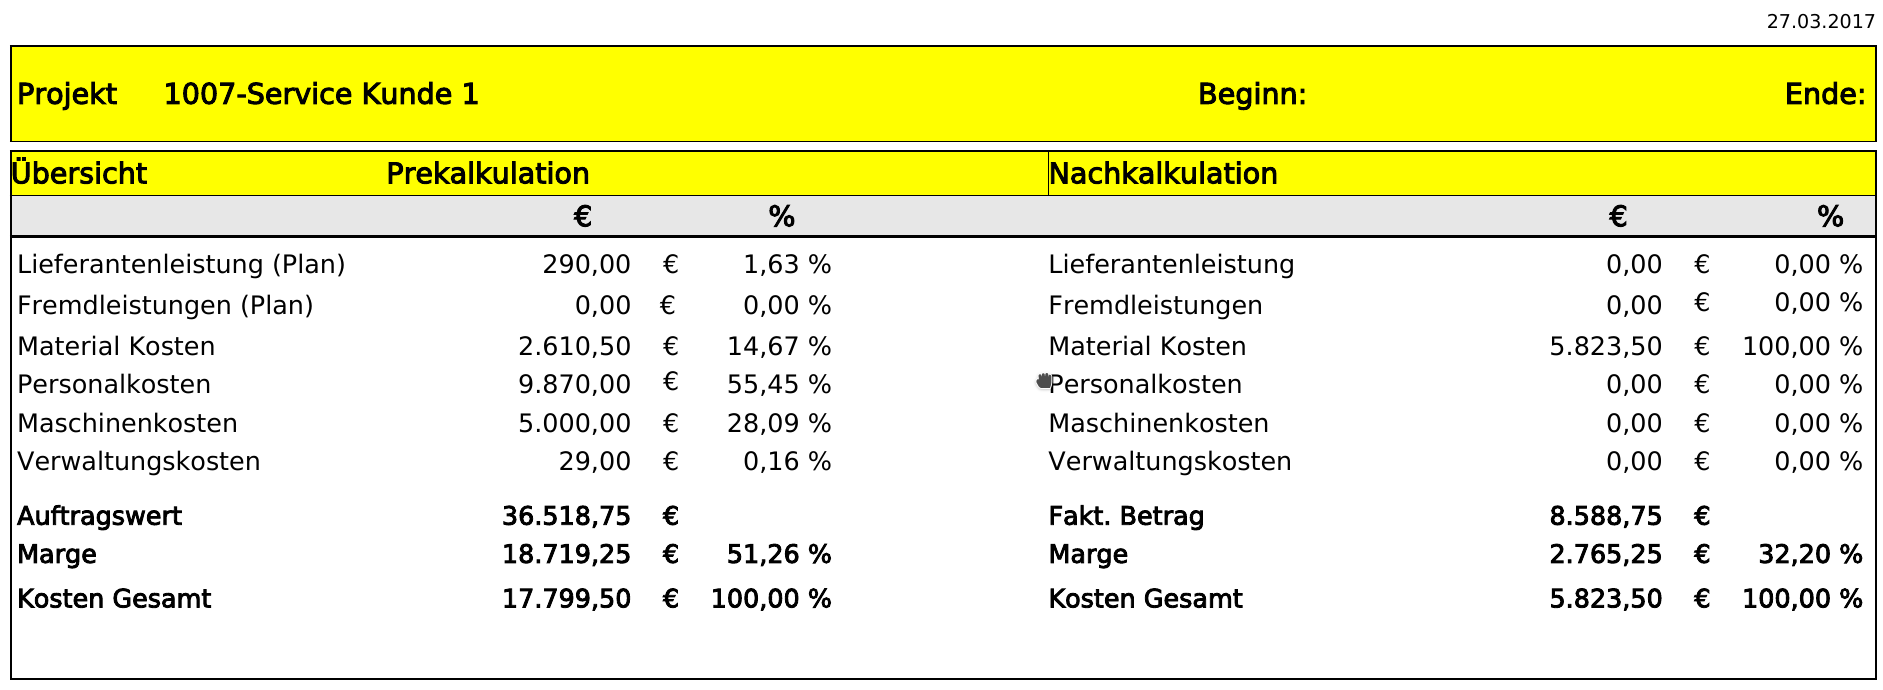 Projekt-Kalkulation